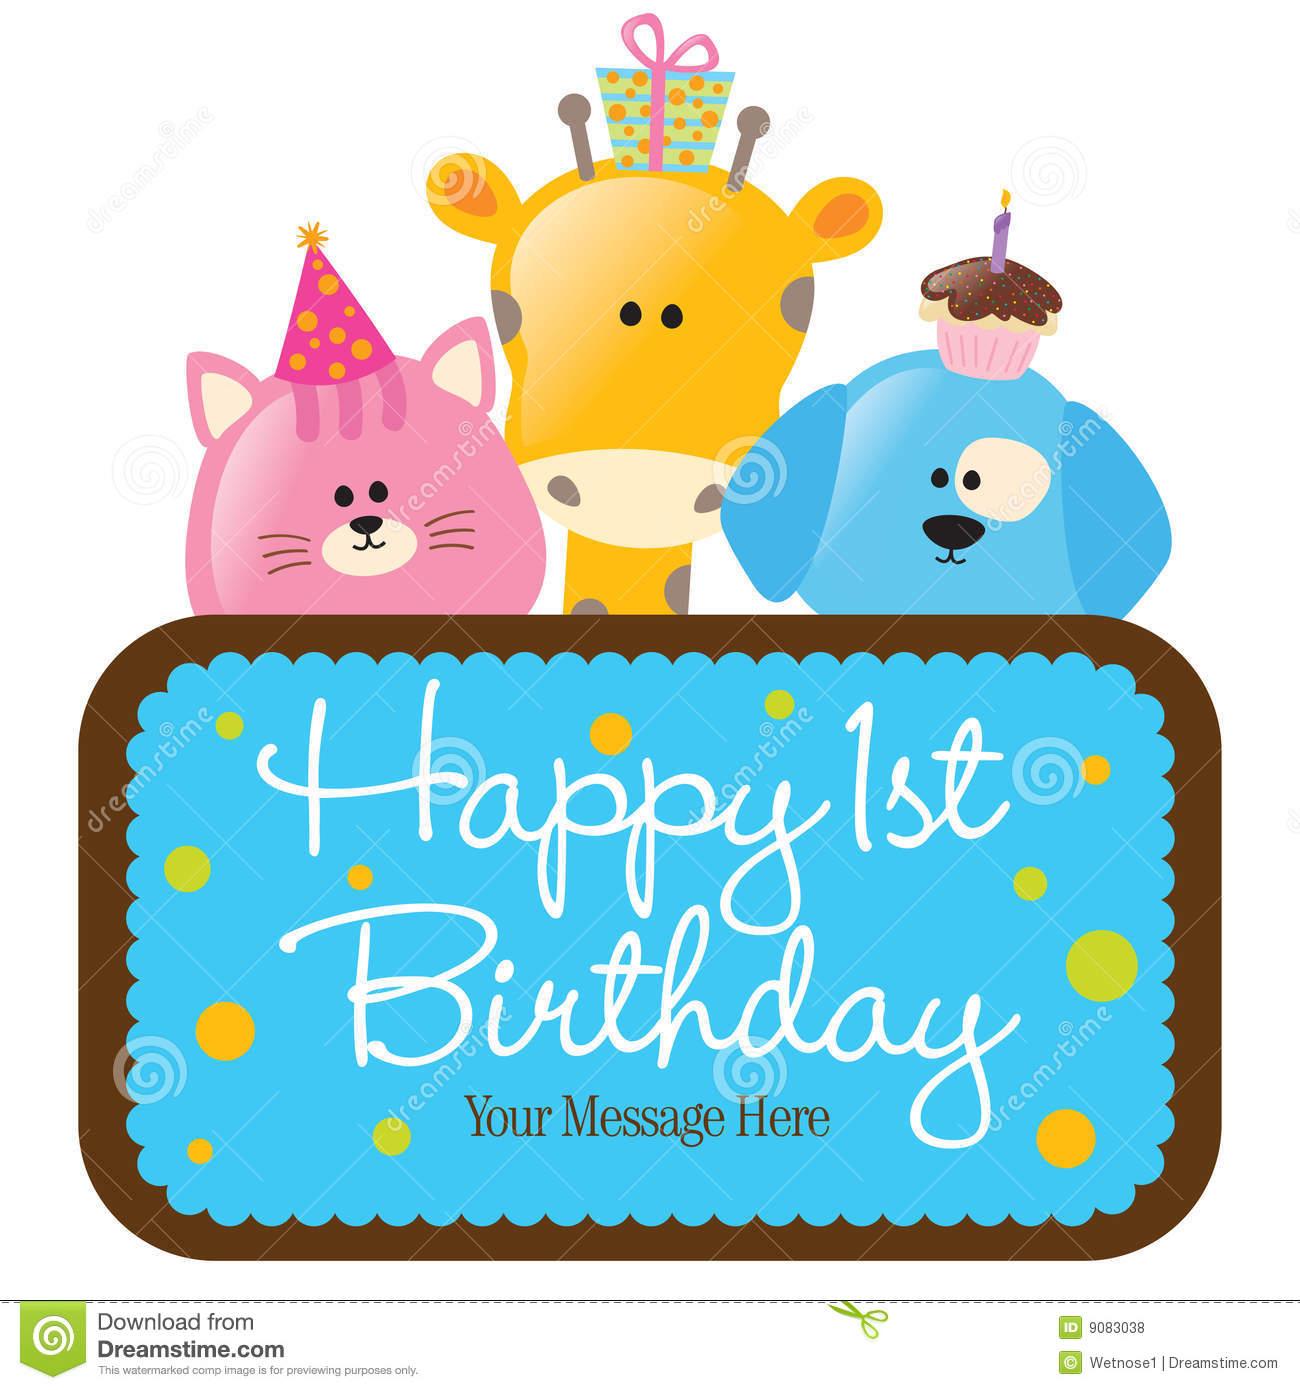 Baby boy 1st birthday clipart vector download Baby boy 1st birthday clipart - ClipartFest vector download